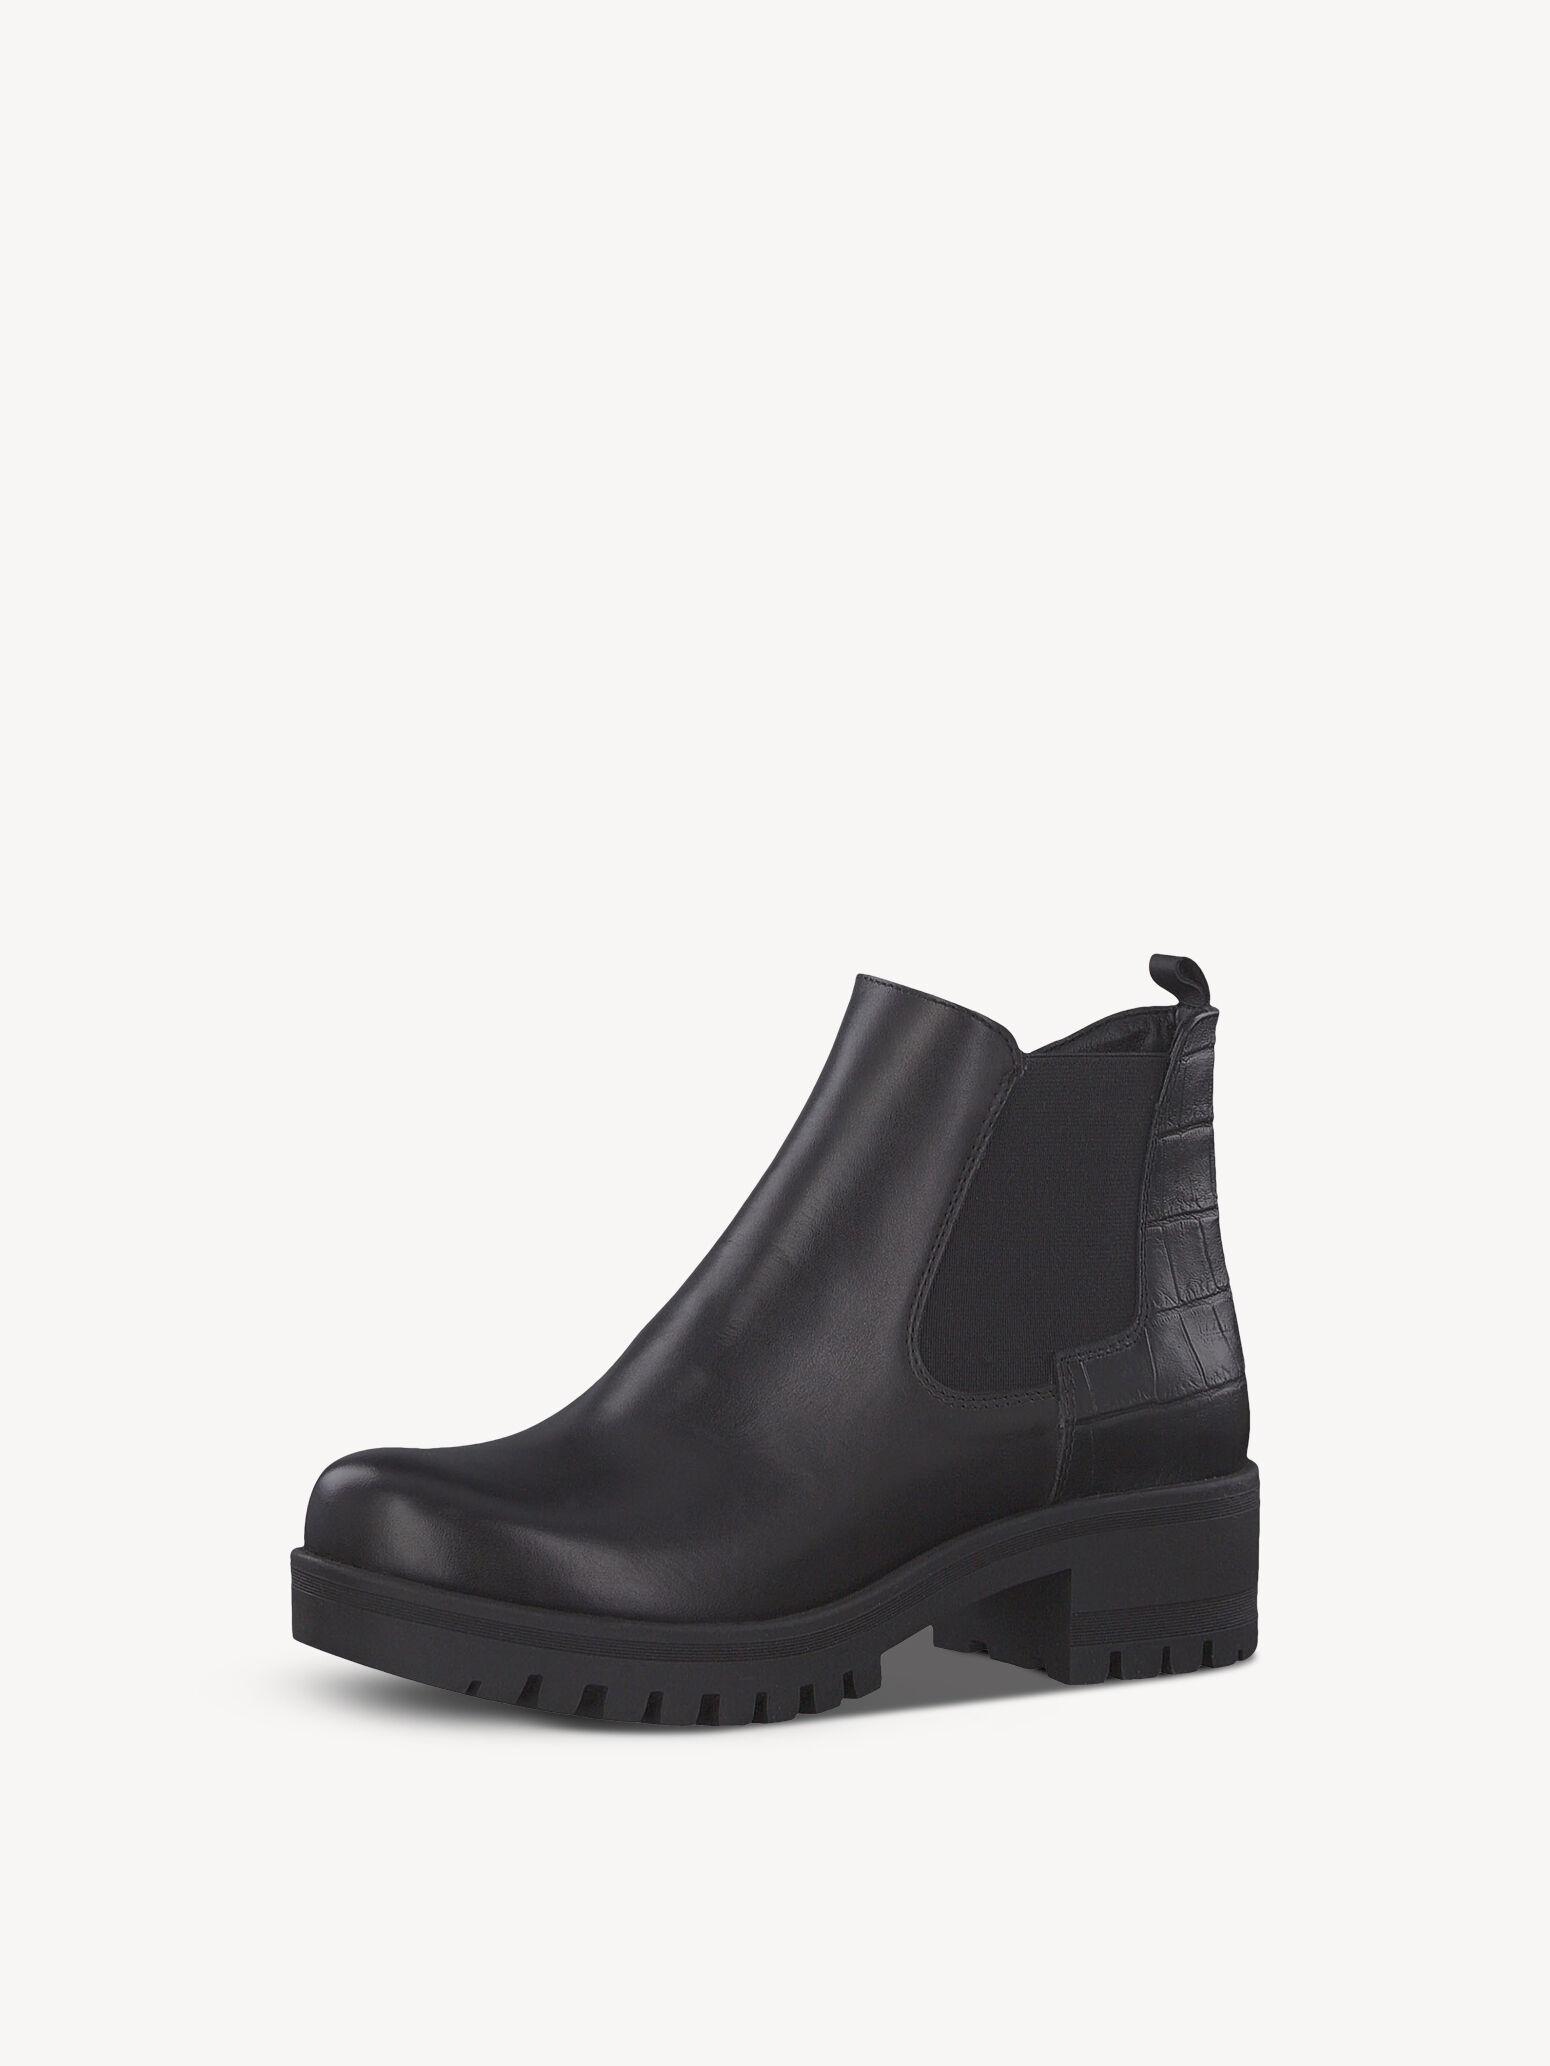 Chelsea Boots online kaufen Tamaris Damenschuhe